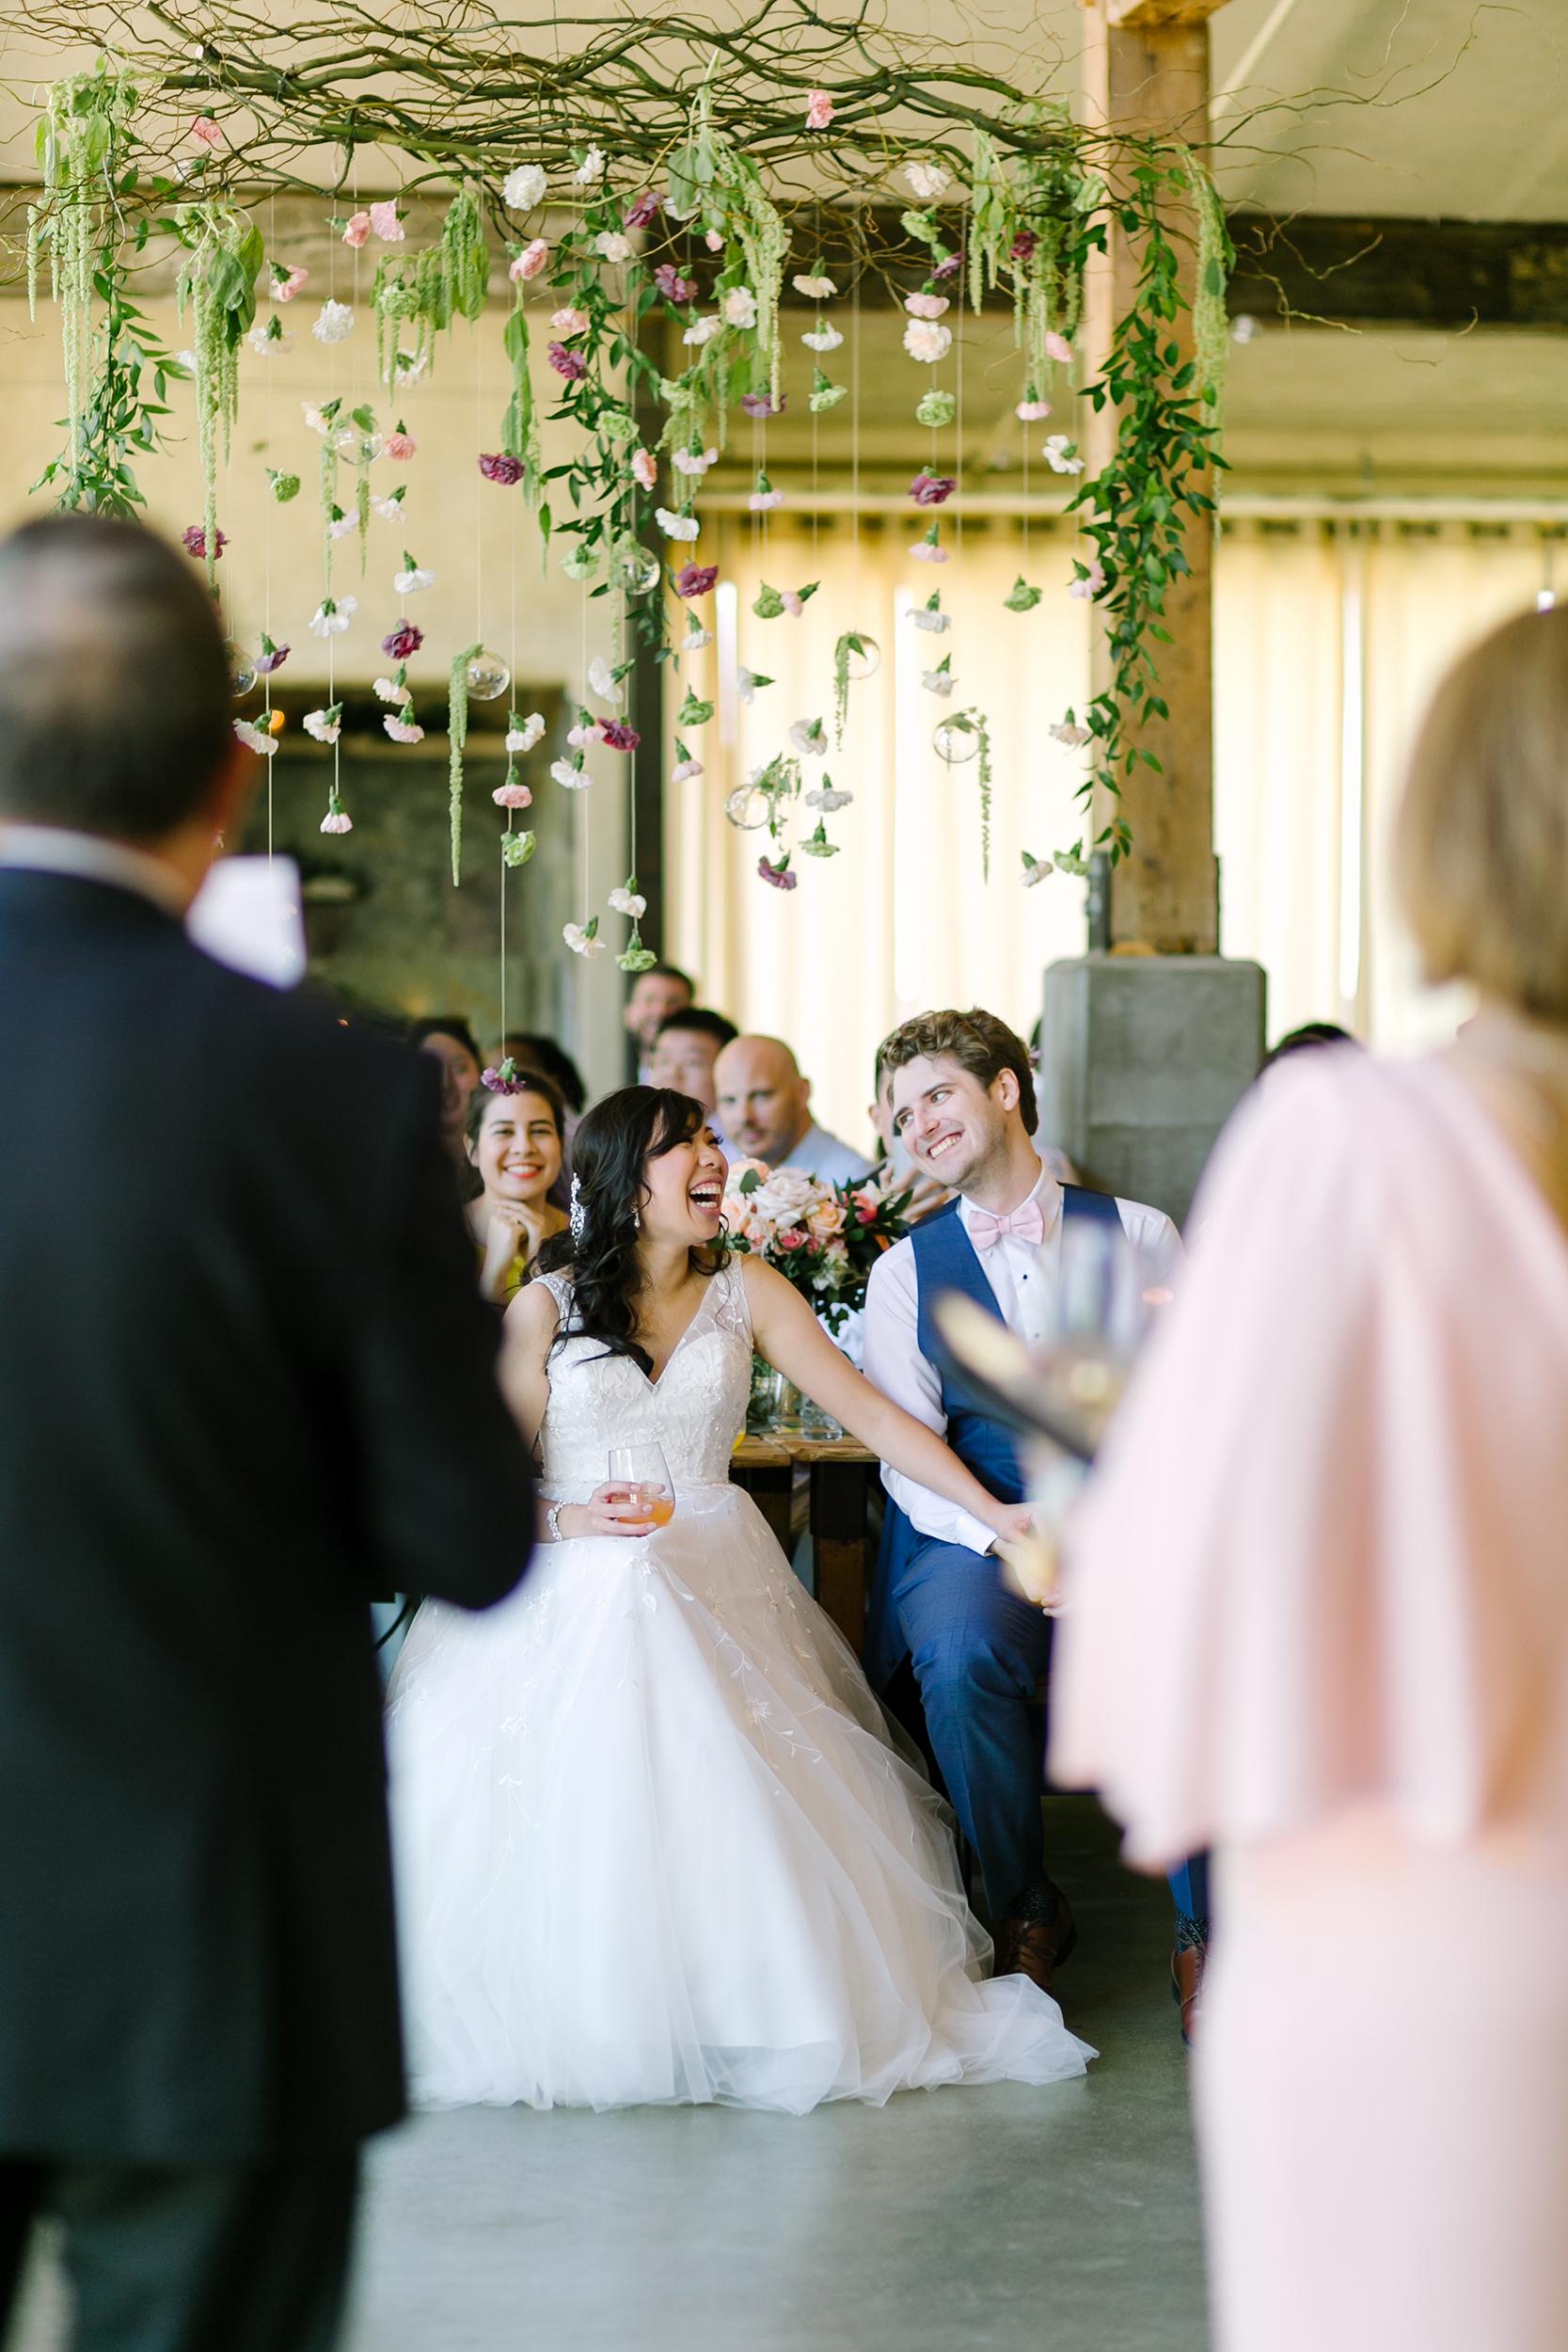 Austin_Wedding_Photographer_Kimberly_Brooke_Photographic_042.jpg